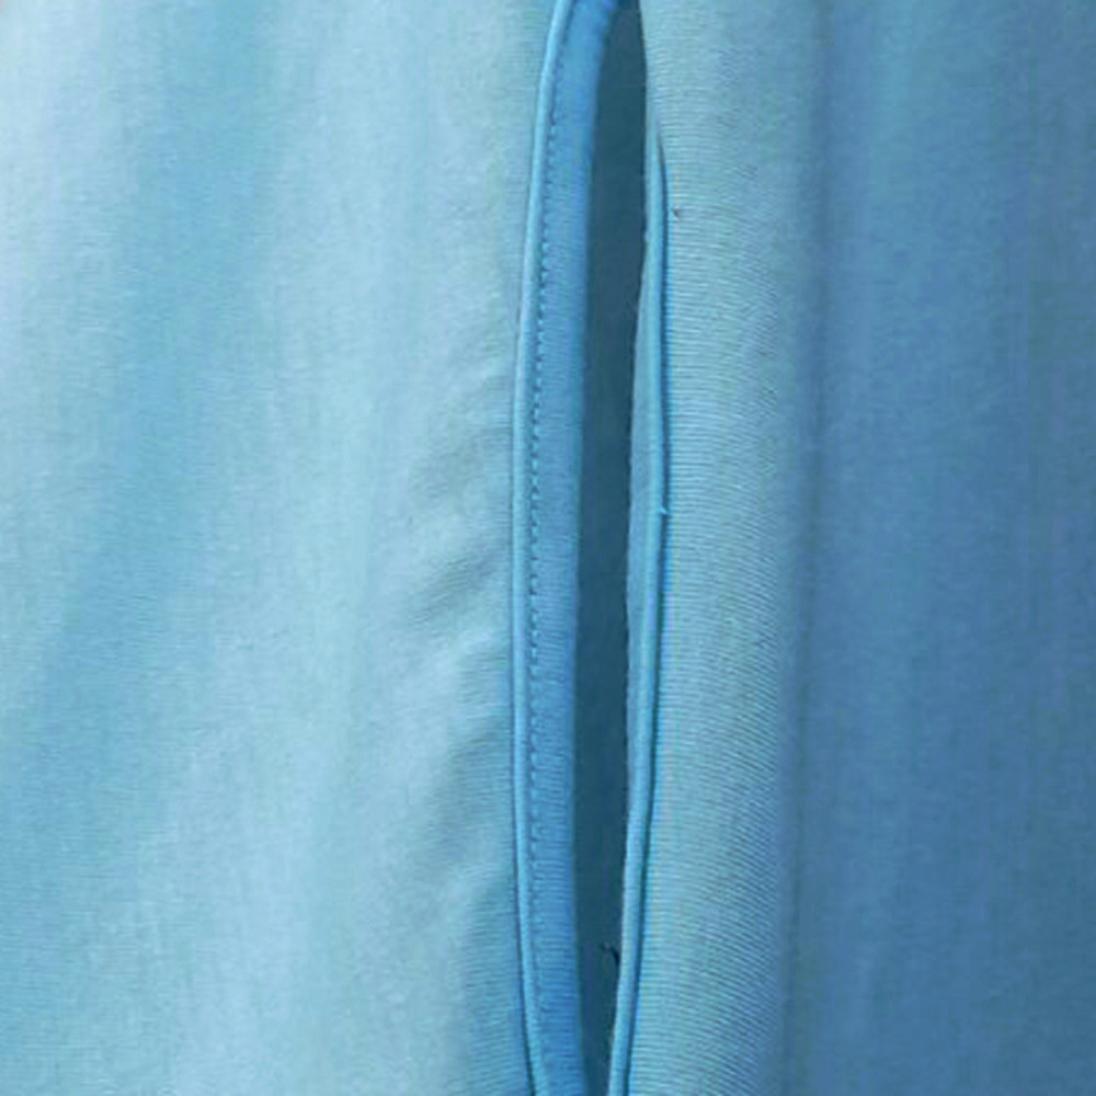 d077208eb ... Teresamoon Womens Long Sleeve Casual Cold Shoulder Tunic Tops Loose Blouse  Shirts Teresamoon-Blouse ...